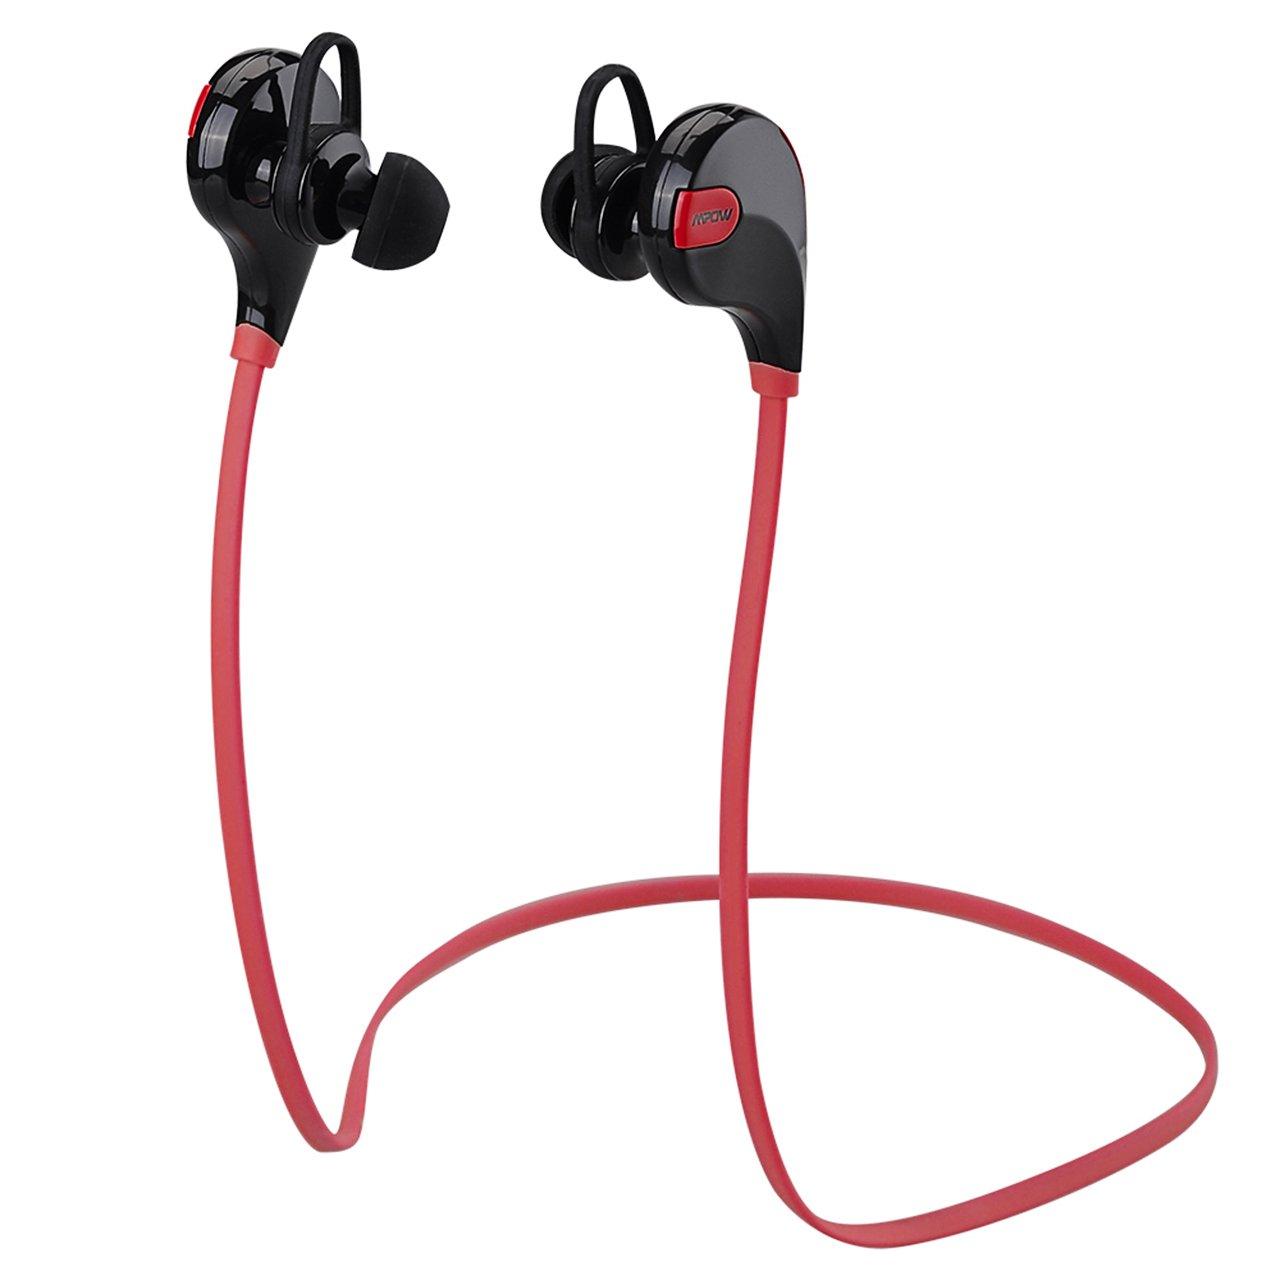 [Modified Versión] Mpow Swift estéreo inalámbrico Bluetooth 4,0 deporte auriculares funcionamiento auriculares auriculares con MIC manos libres ...